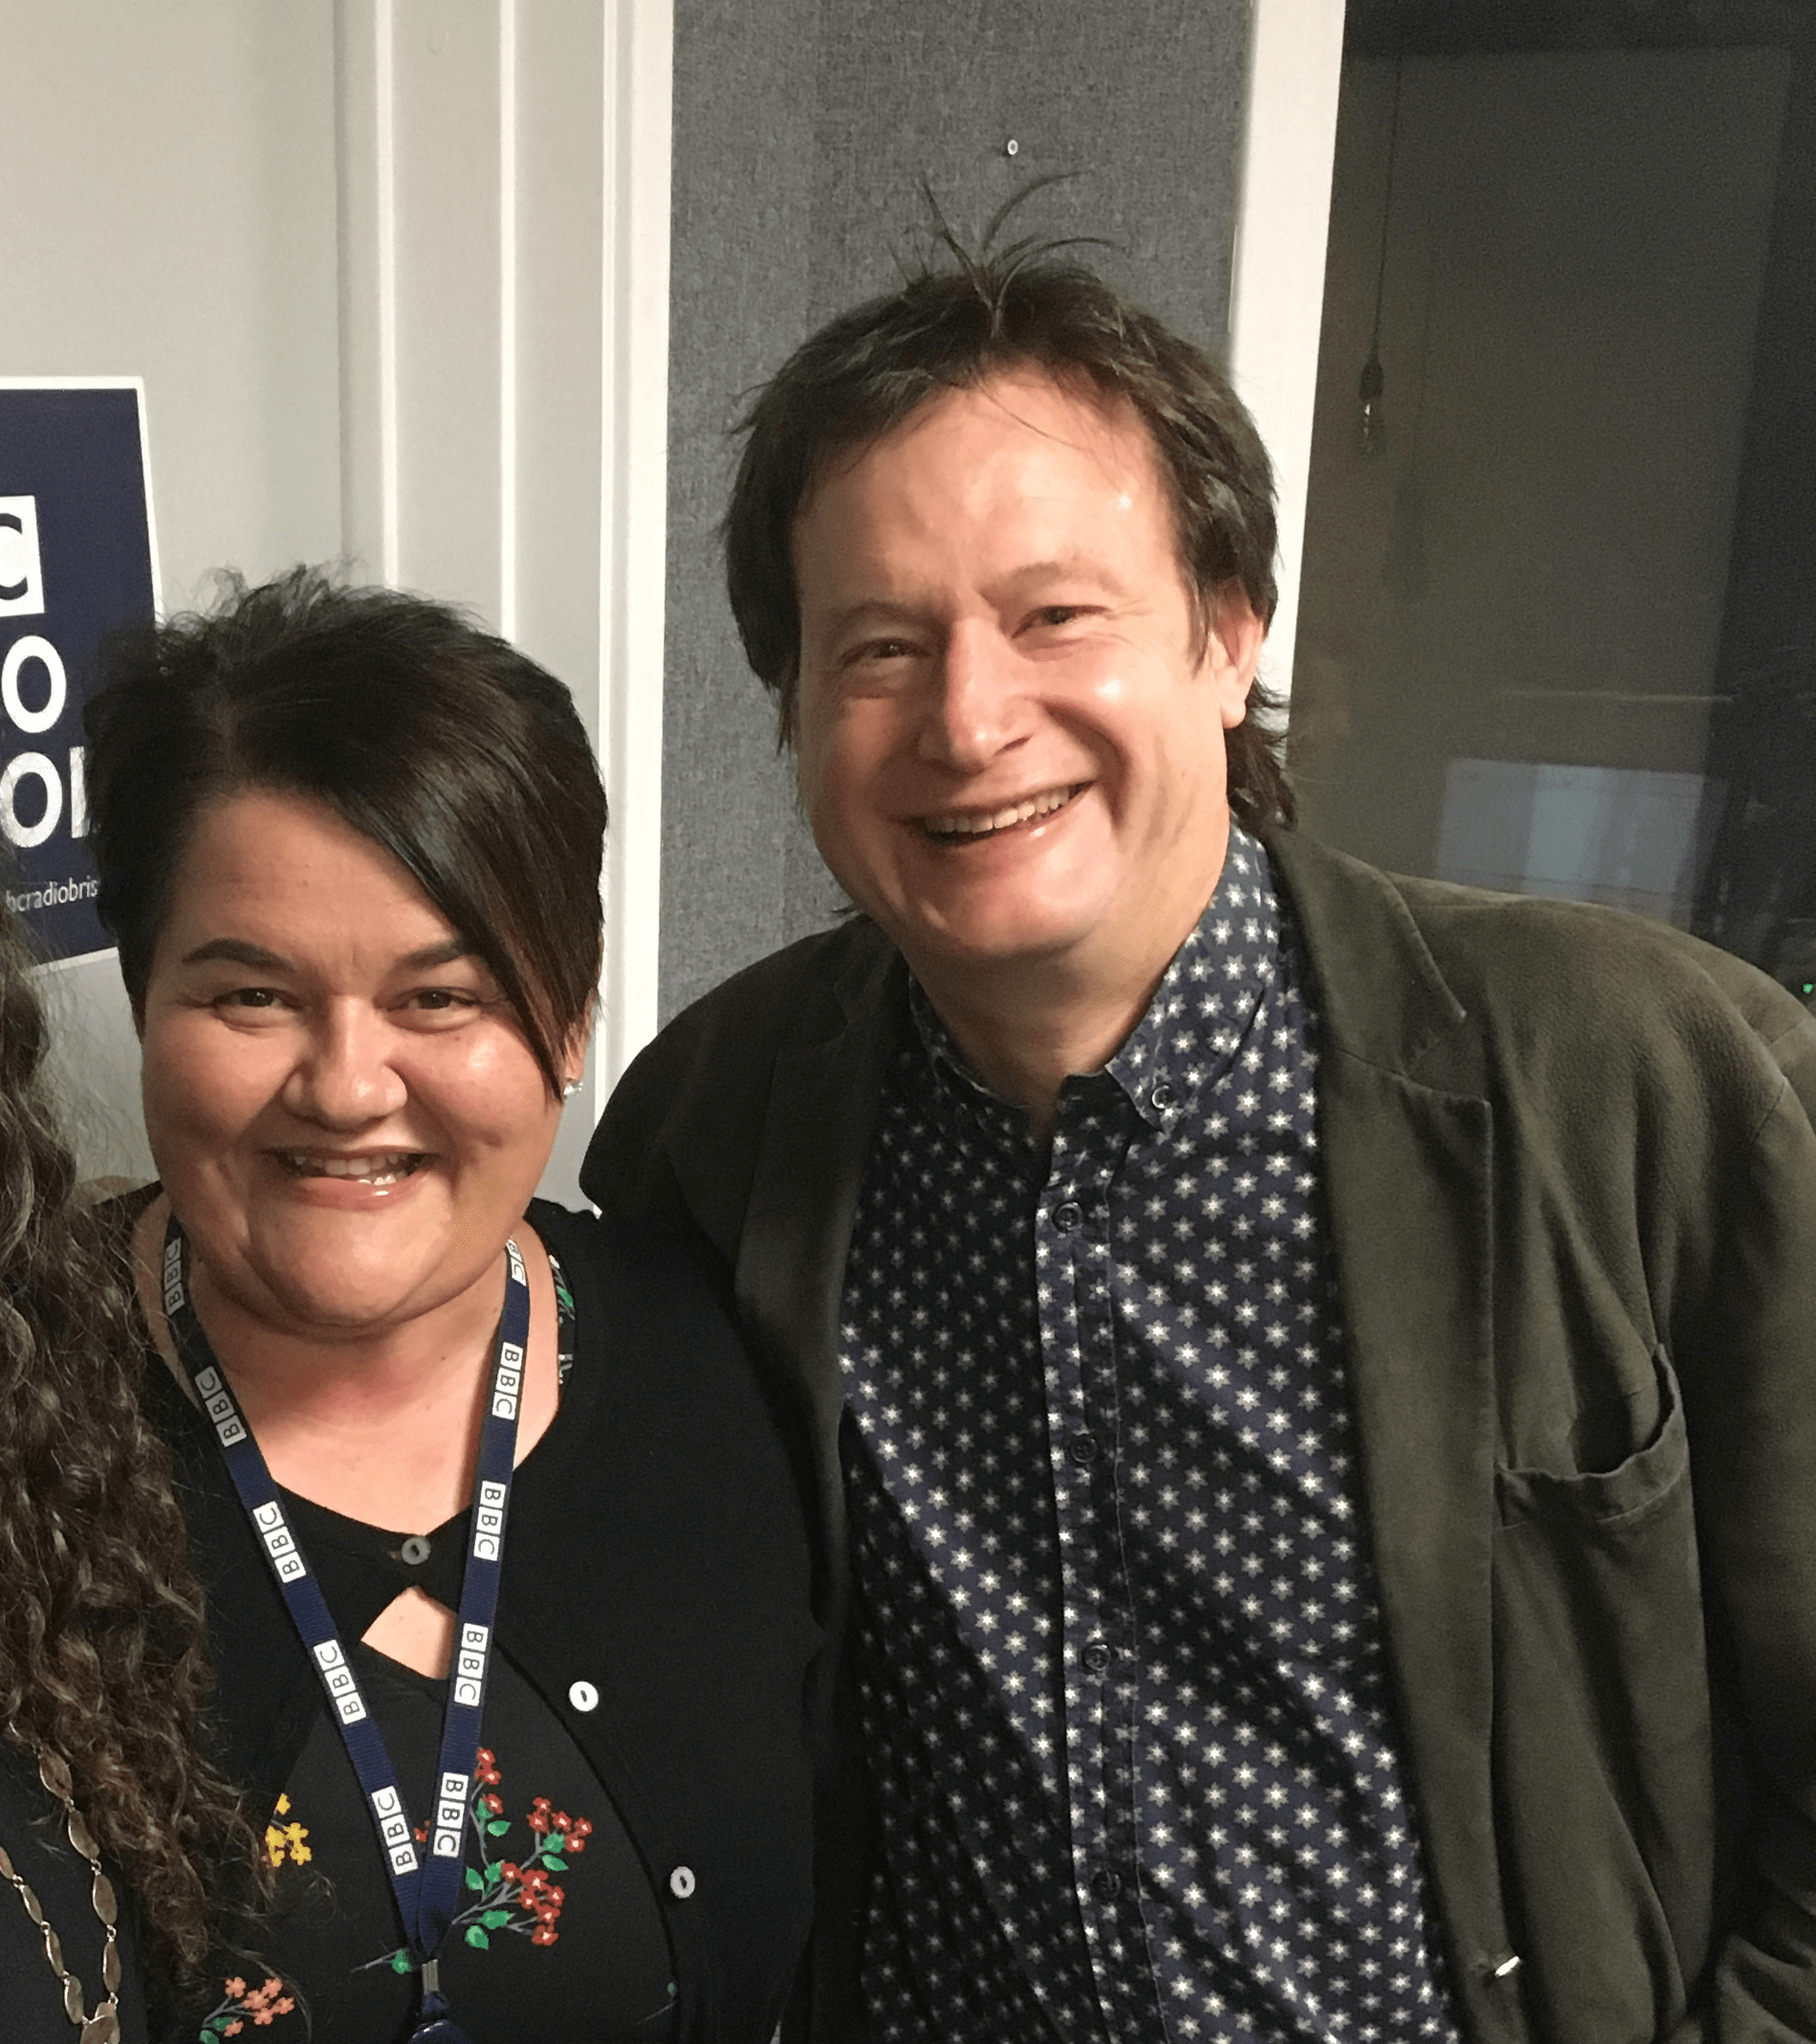 Professor Bruce Hood and the BBC's Emma Britton